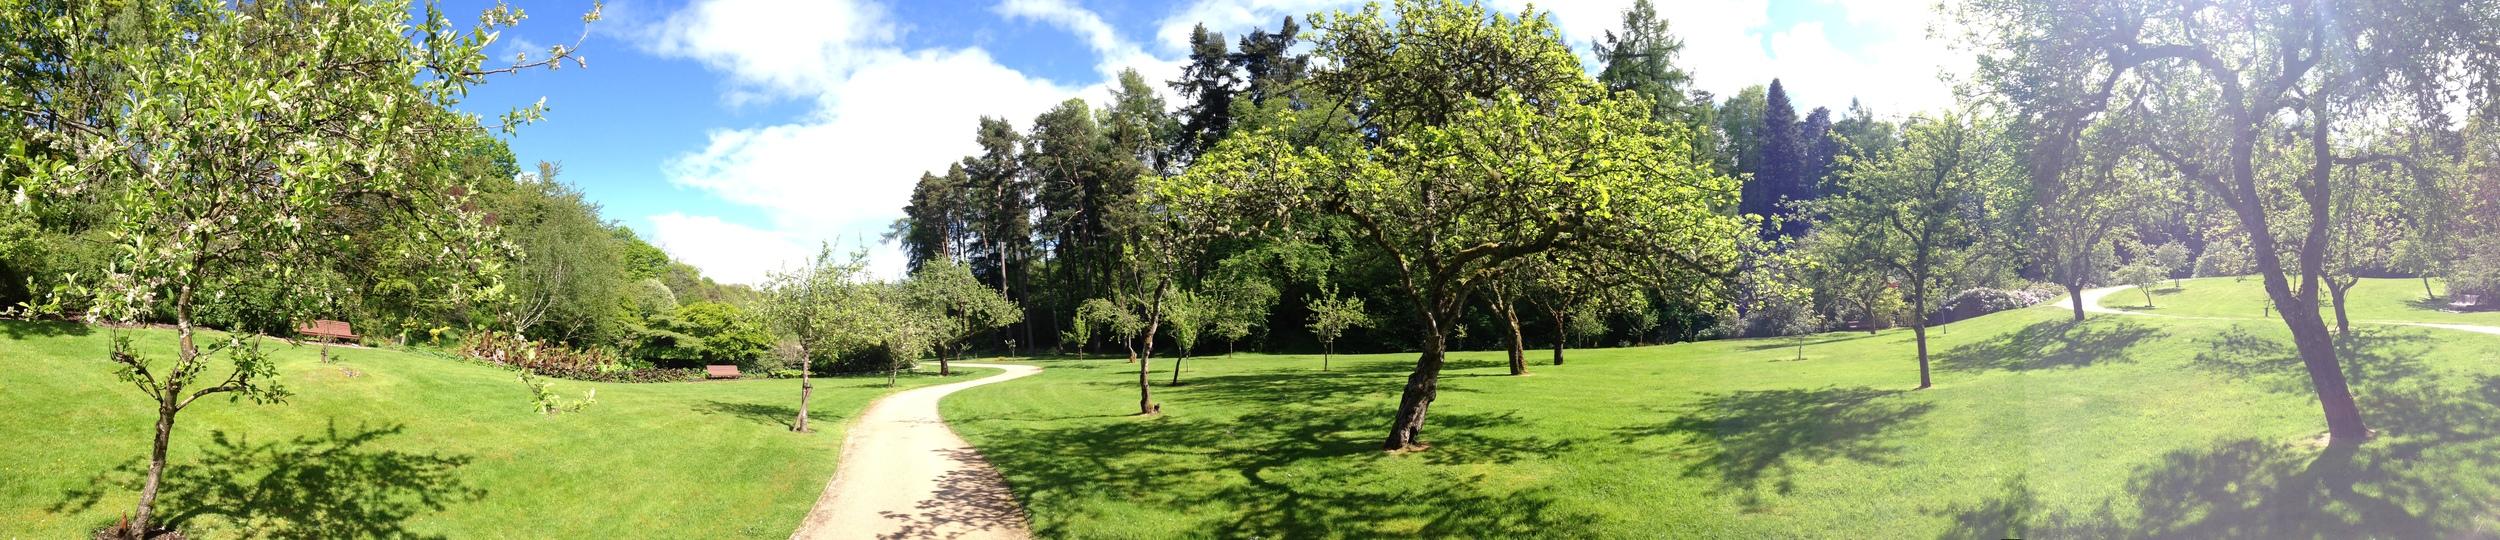 gardens of Scotland Glen Grant whiskey distillery